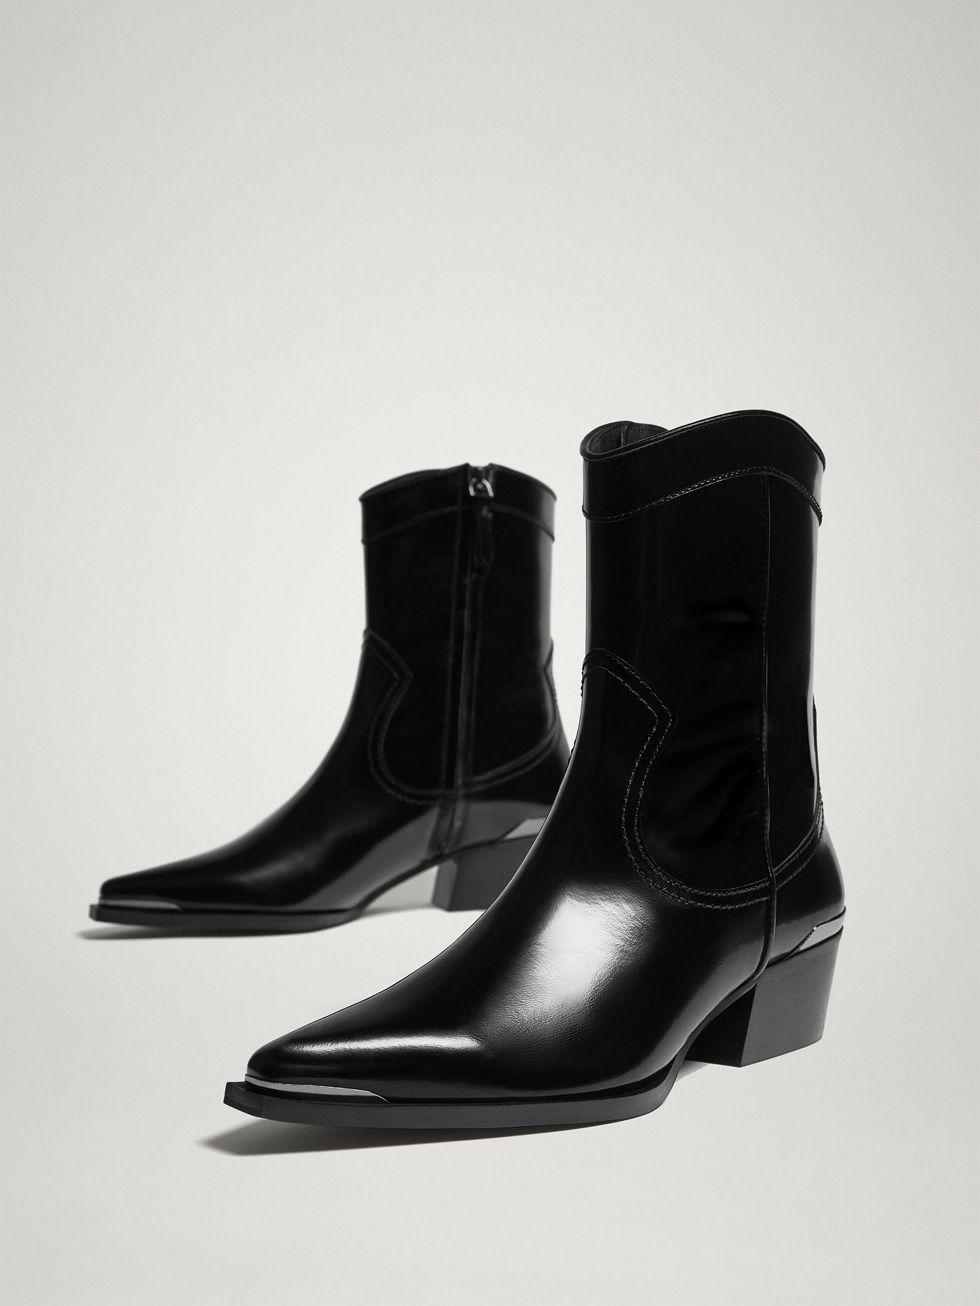 1369f6262ca BLACK ANTIK LEATHER COWBOY ANKLE BOOTS - Women - Massimo Dutti ...